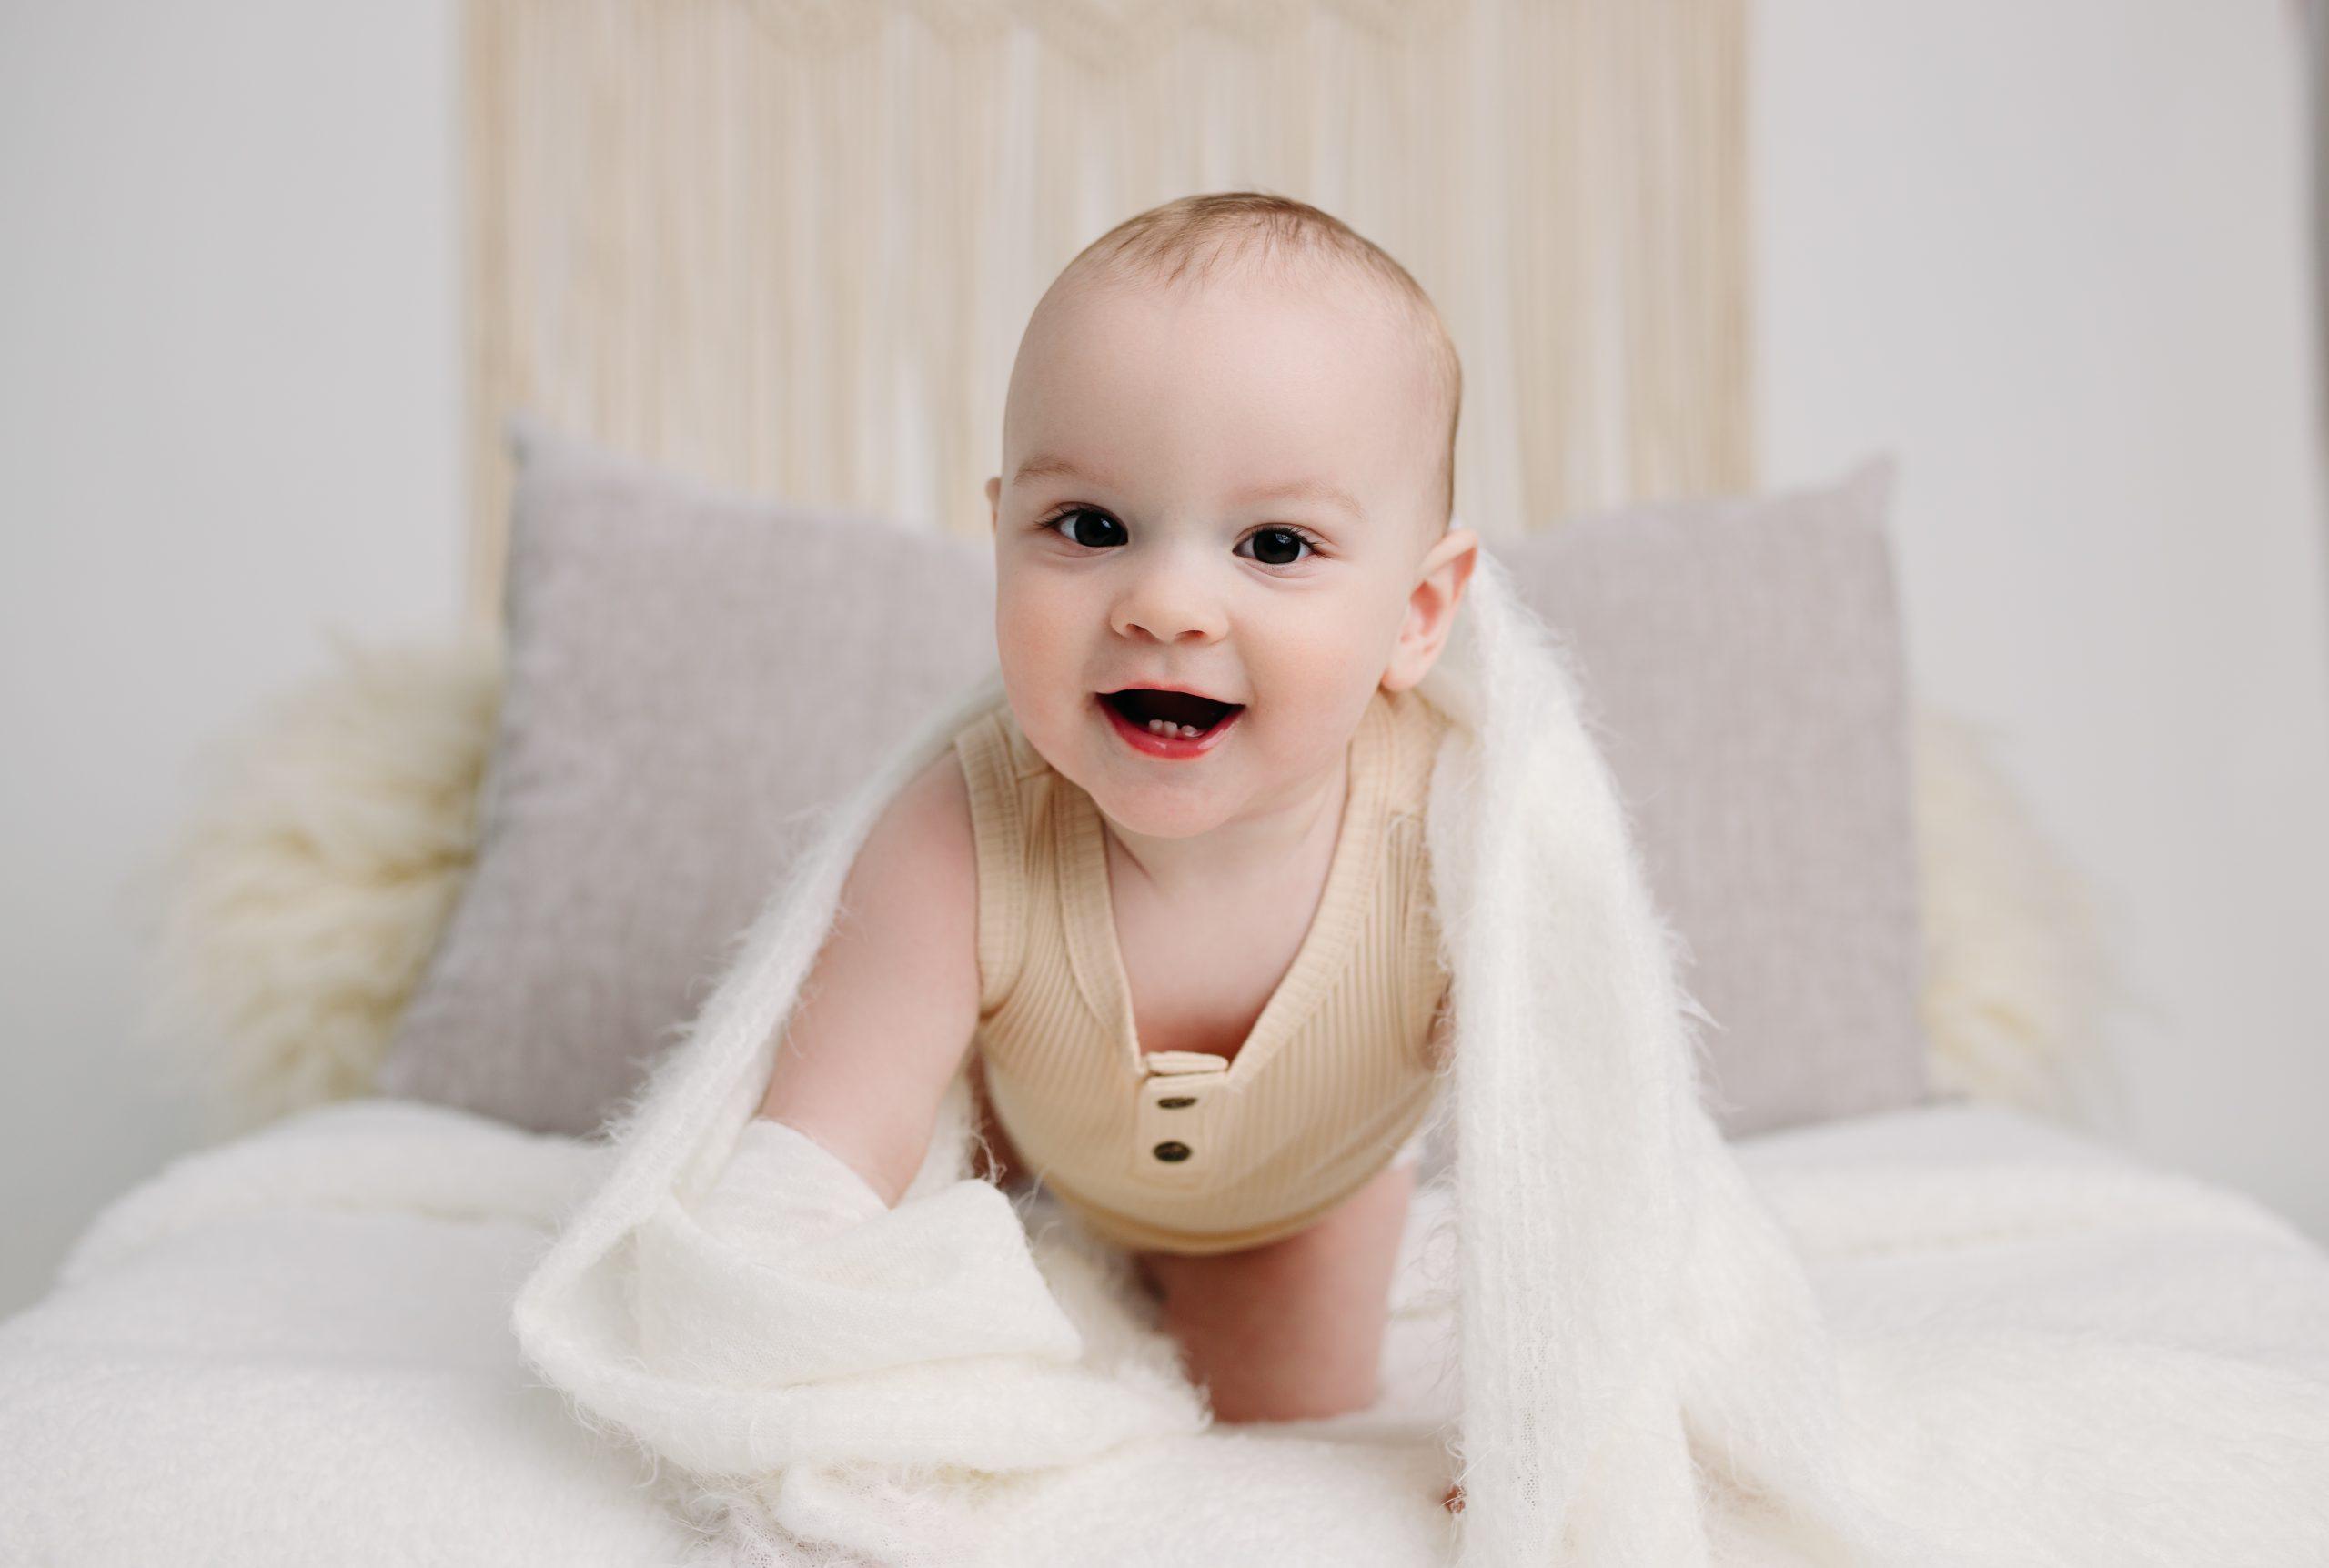 Zionsville Indiana Baby Infant Photo Session Studio Milestone